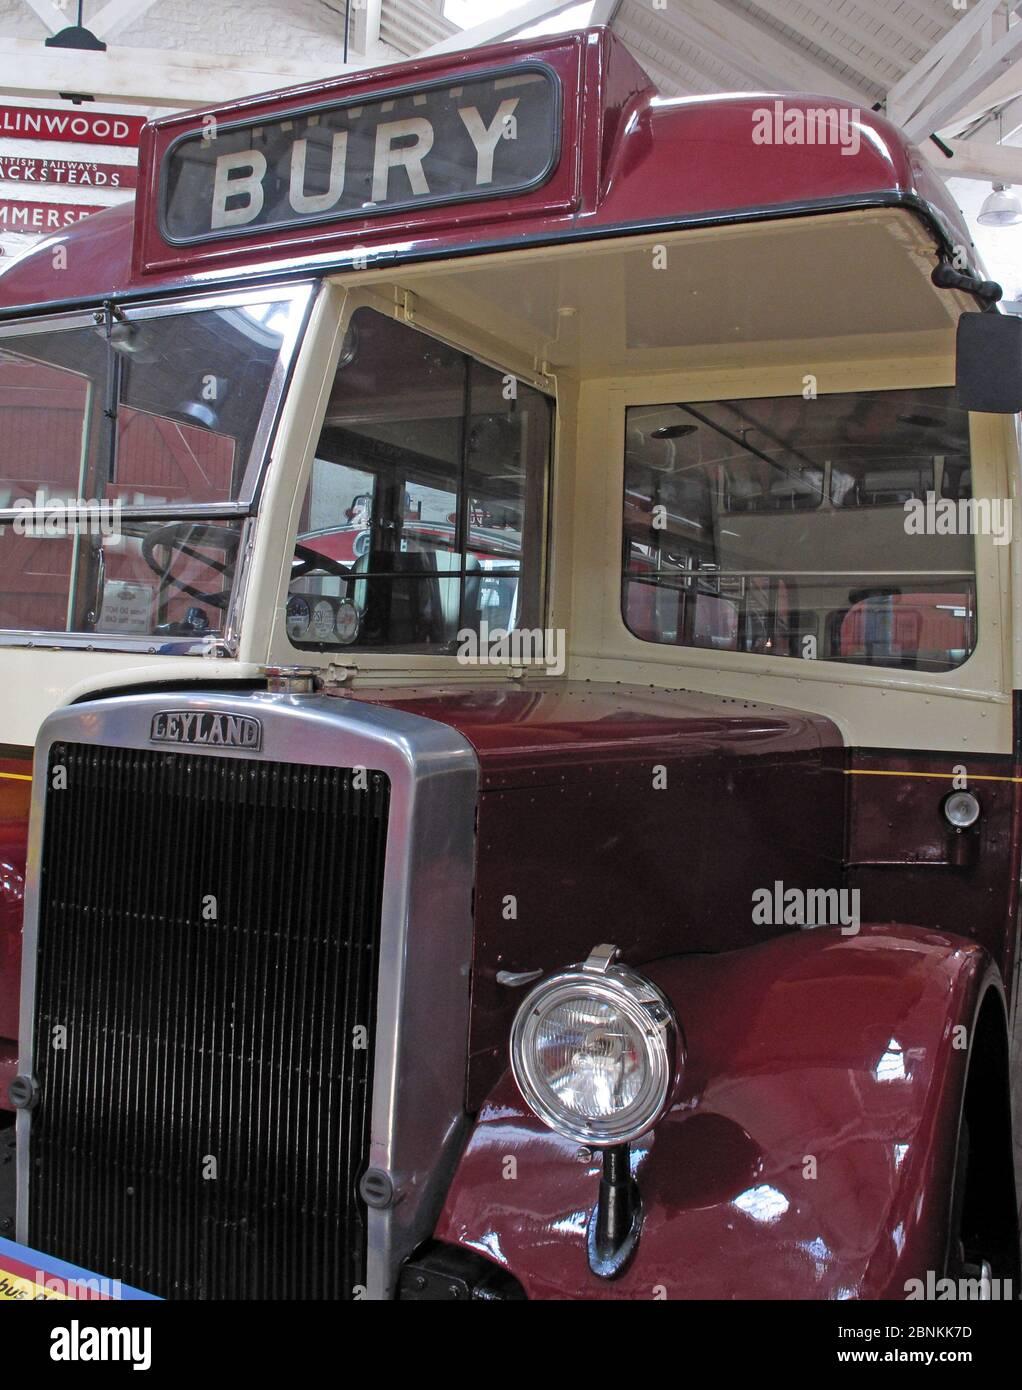 HotpixUK,@HotpixUK,GoTonySmith,Bury Bolton Street,Bury,Greater Manchester,Bolton Street,ELR,East Lancs Railway,East Lancashire Railway,heritage,railway,transport,Maroon Bury Corporation bus,Bury council,Maroon,Bury Corporation bus,bus,buses,historic,classic,single,deck